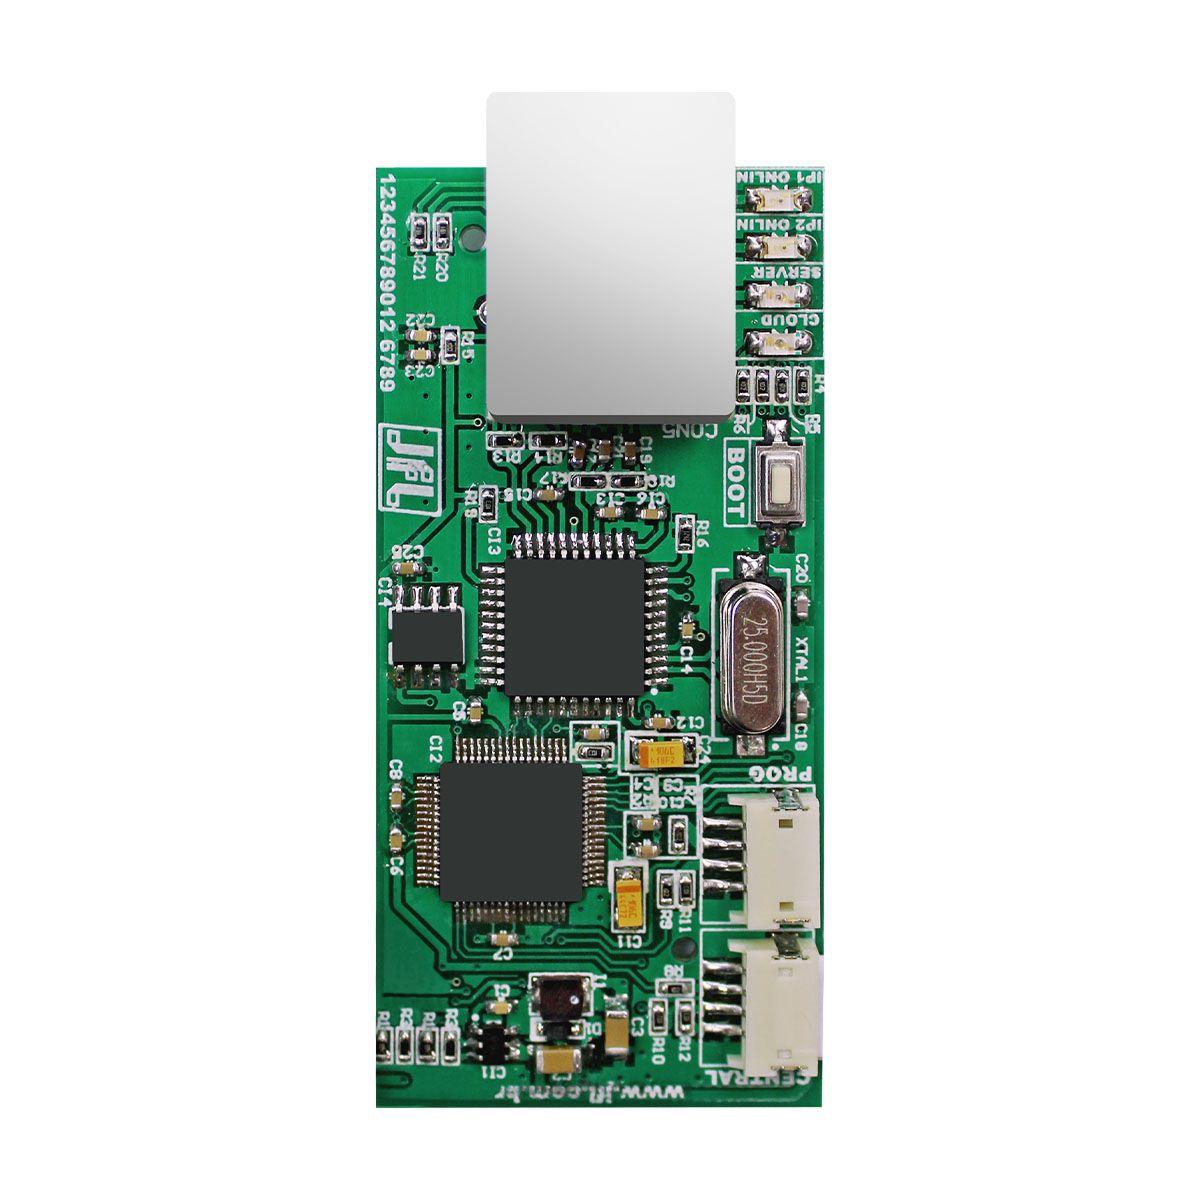 Kit Alarme SmartCloud 18 Jfl Com Sensores Sem Fio Jfl